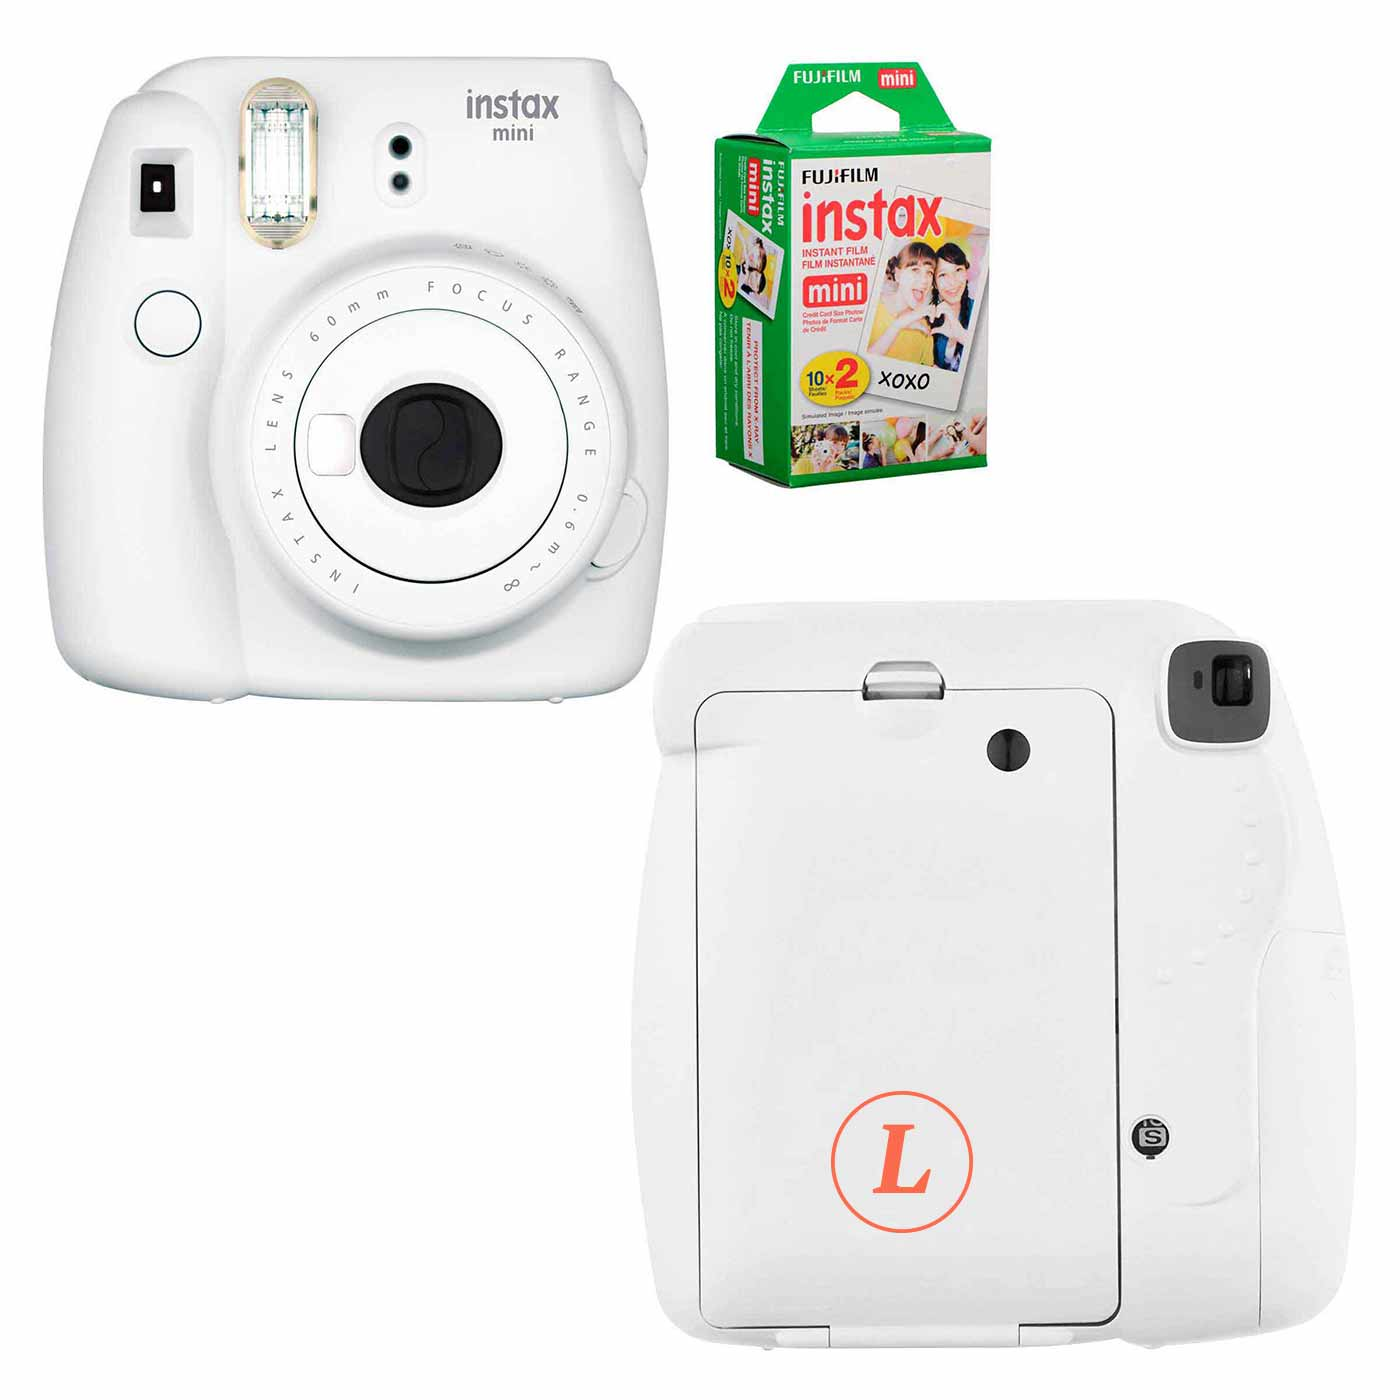 165513 instax mini 9 camera bundle one color imprint back of camera